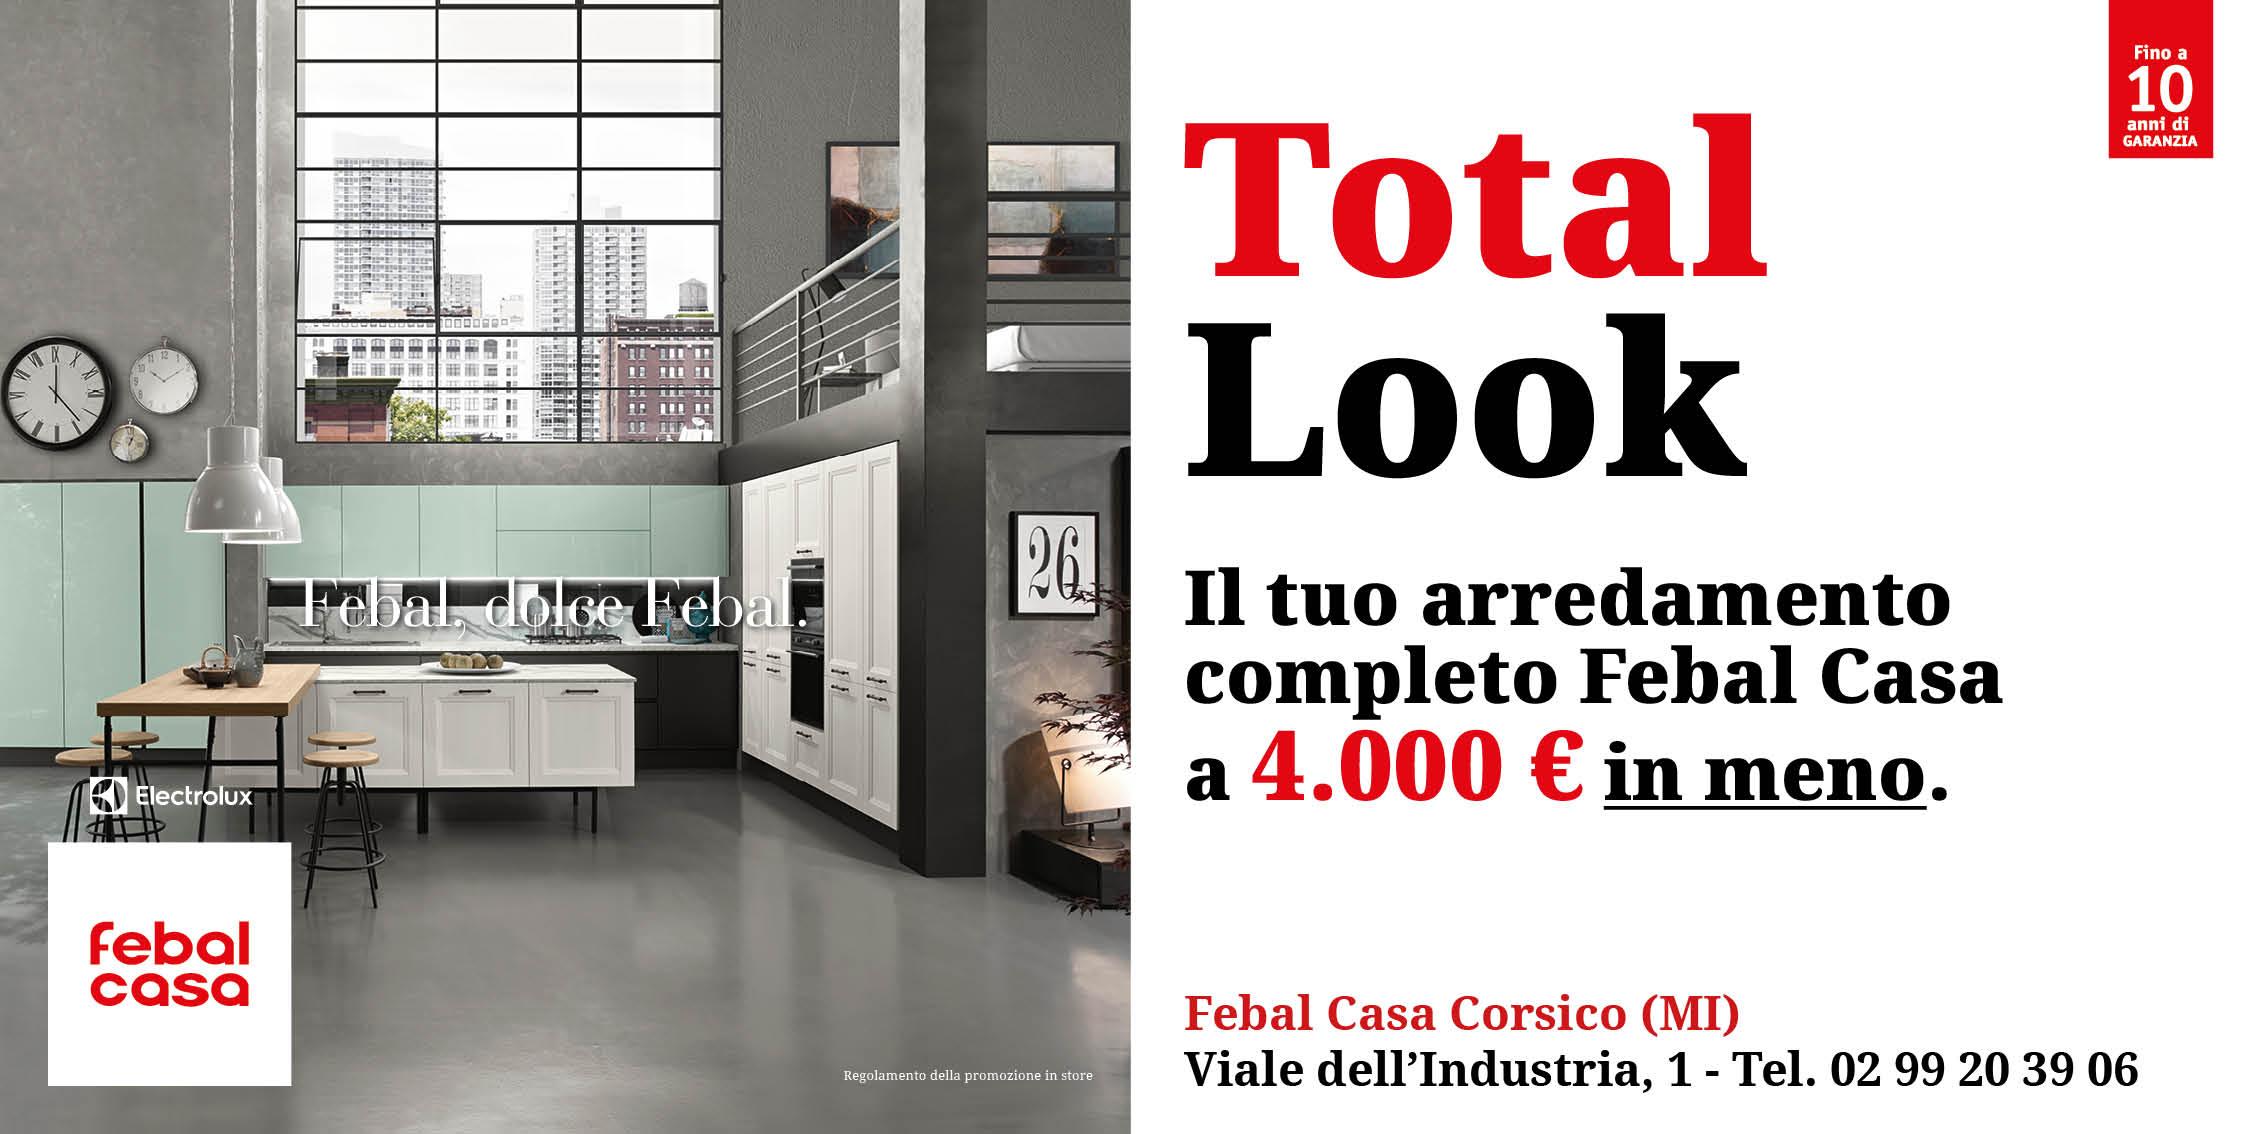 6x3_FC_Corsico - Total_Look_billboard